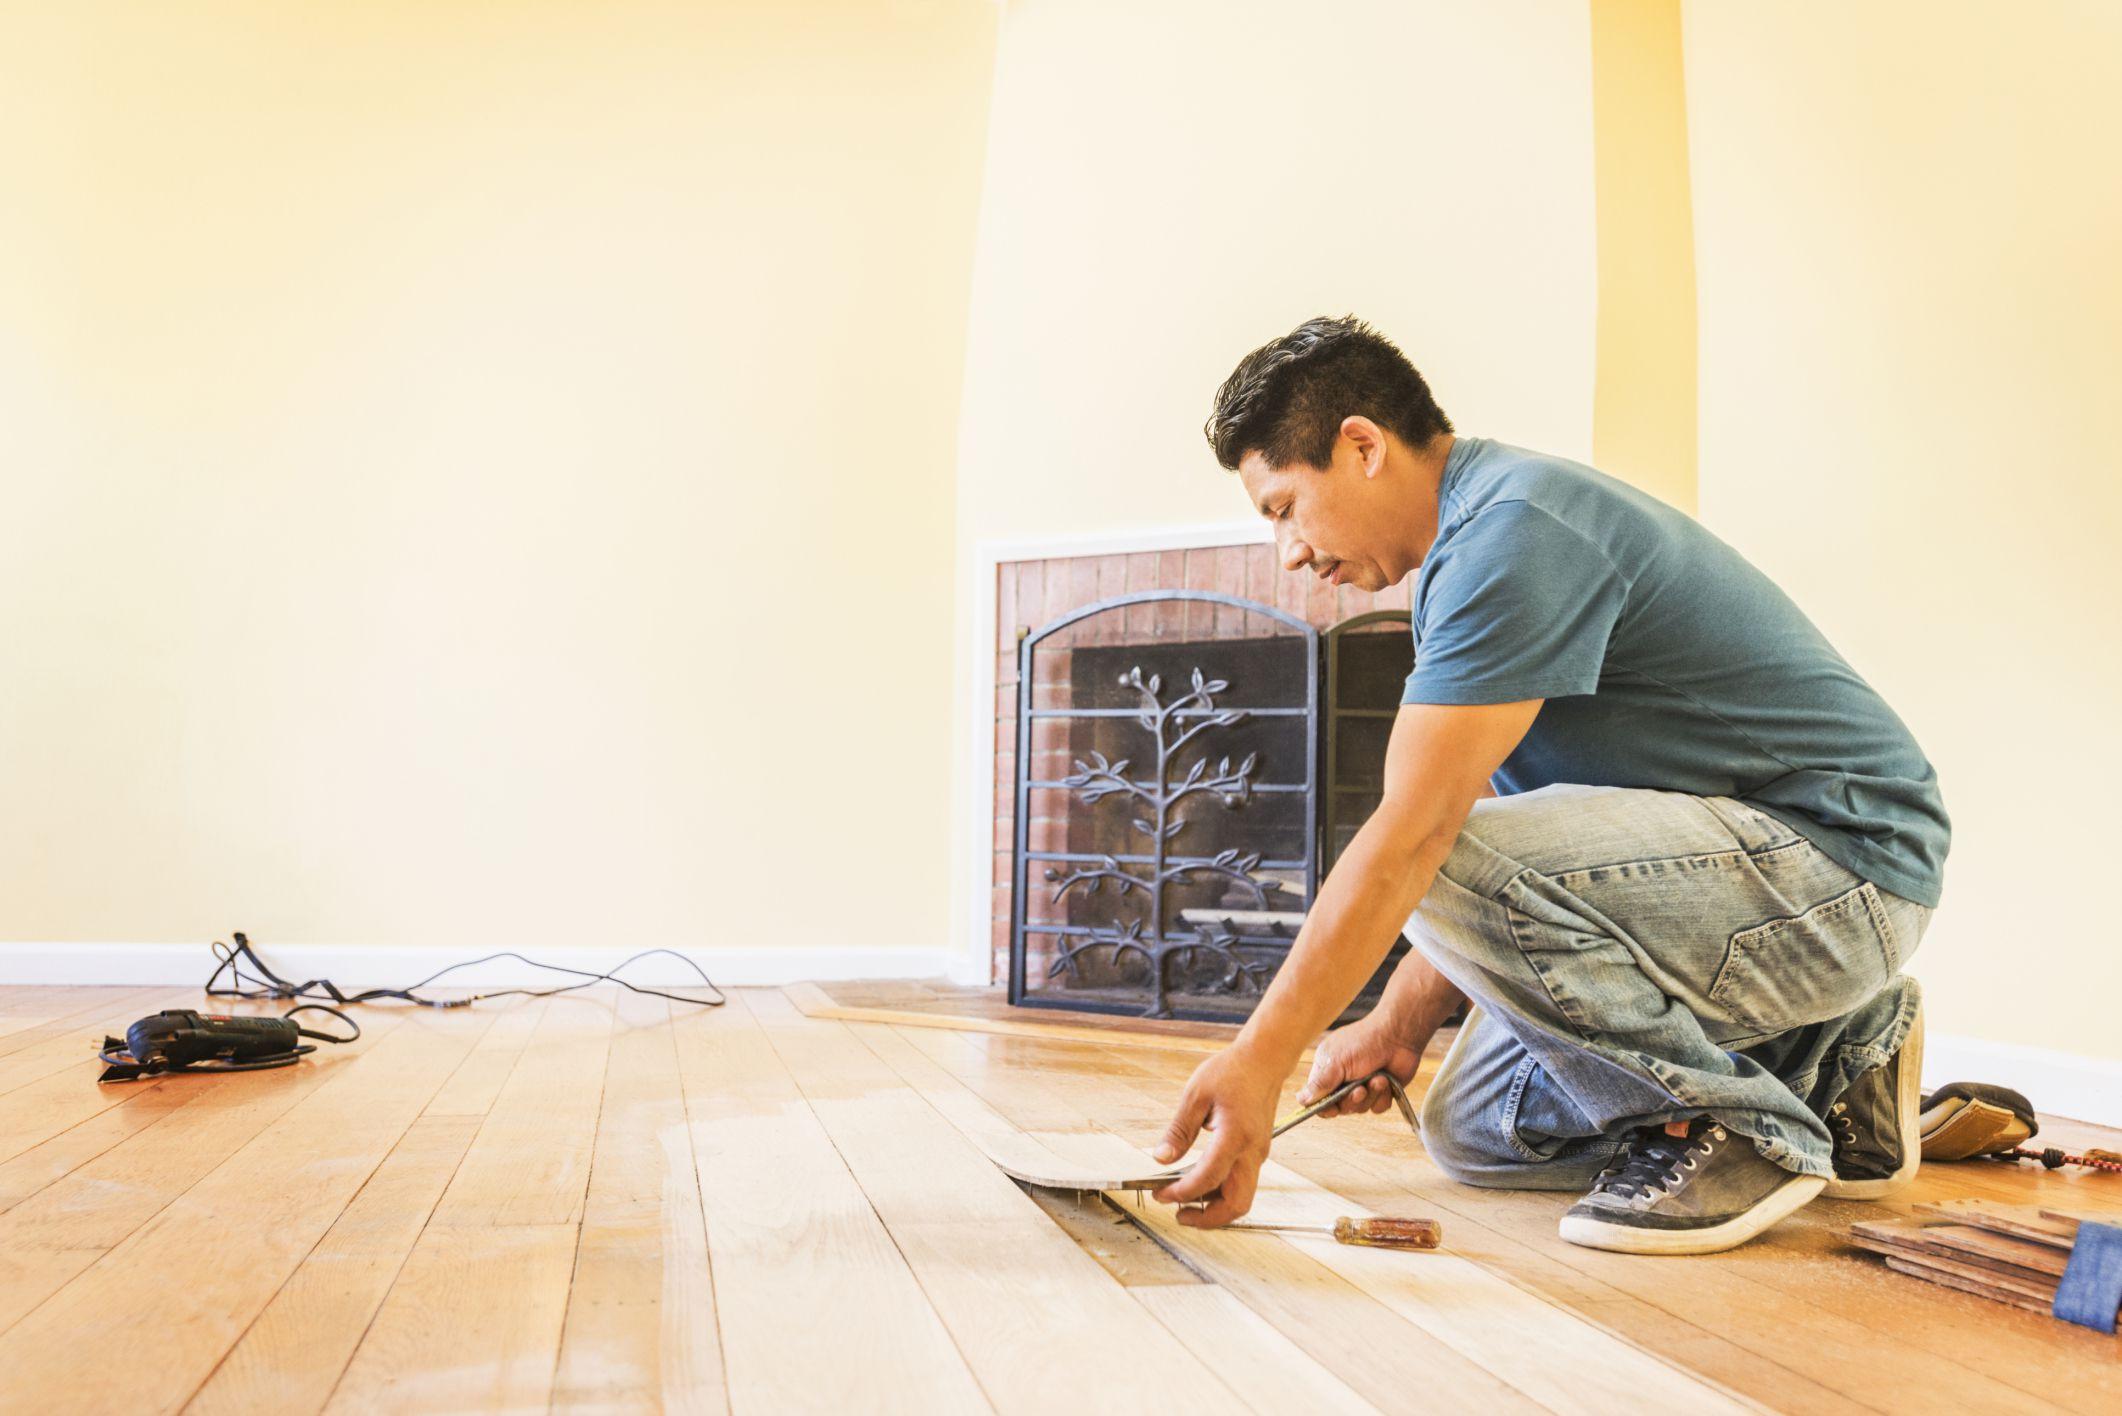 engineered vs solid hardwood flooring of solid hardwood flooring costs for professional vs diy in installwoodflooring 592016327 56684d6f3df78ce1610a598a